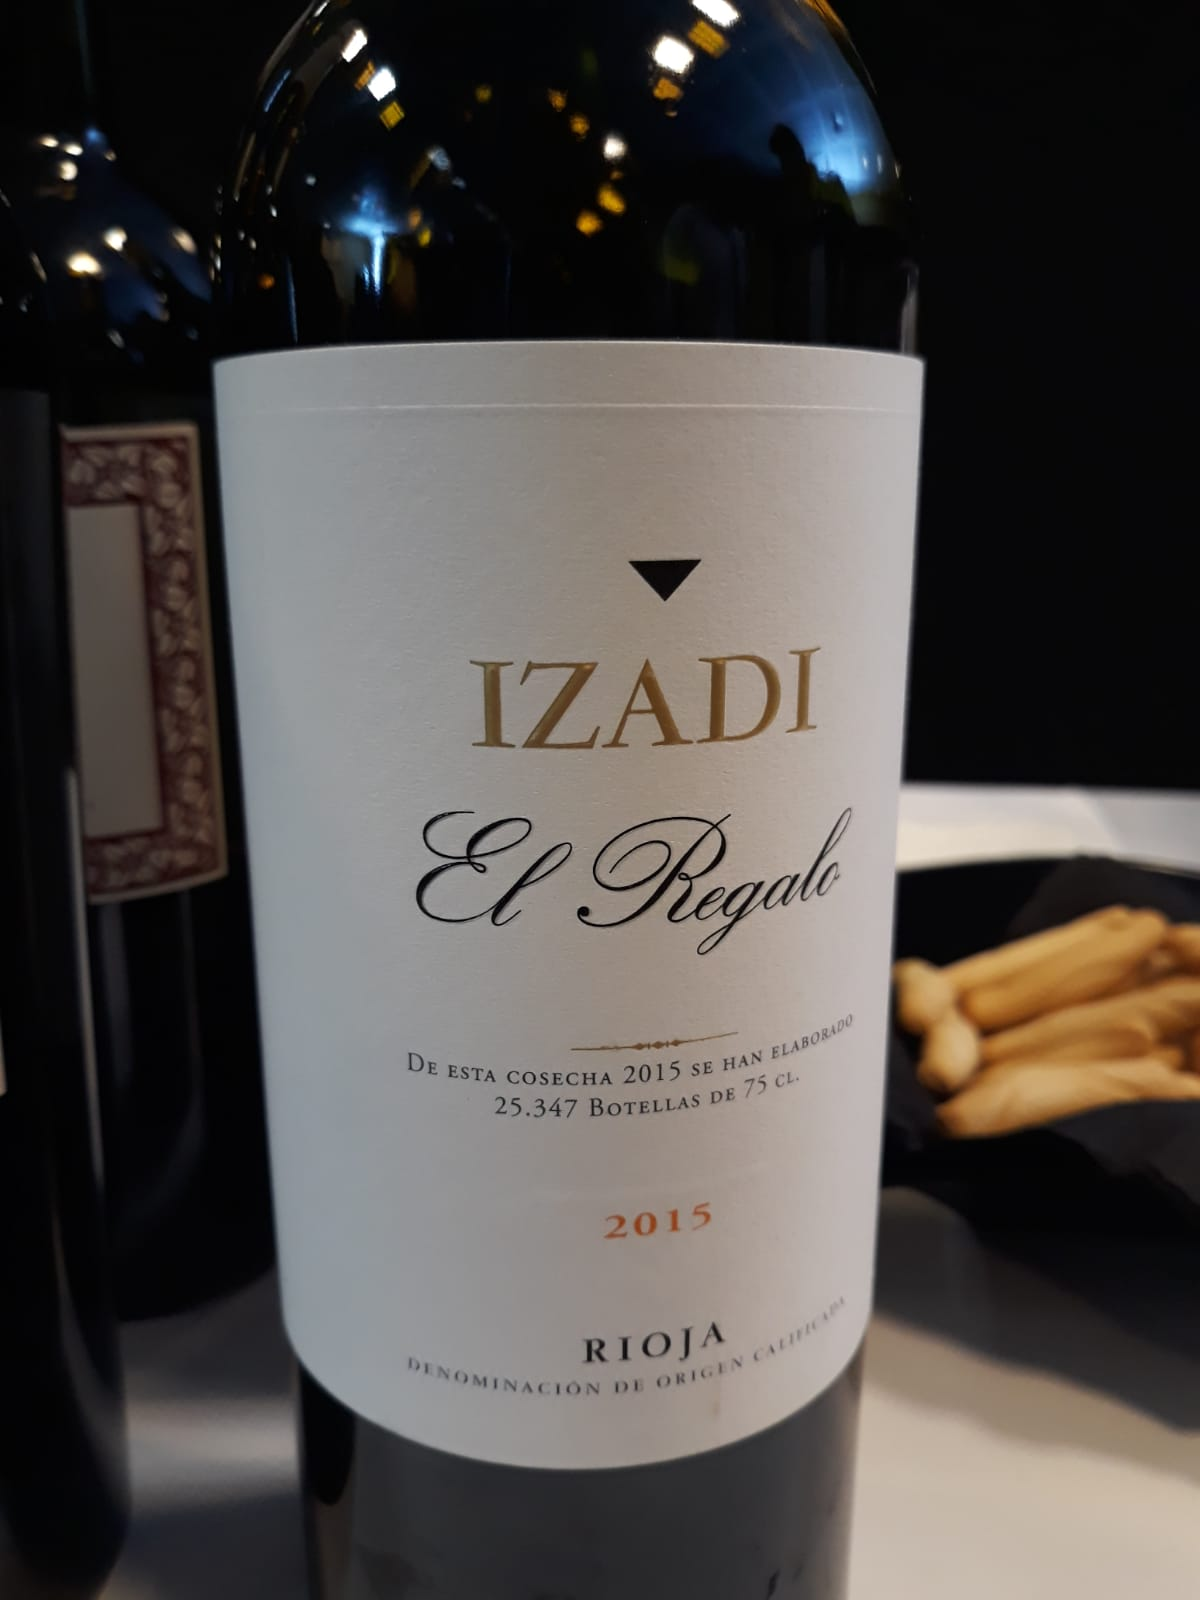 Izadi El Regalo 2015